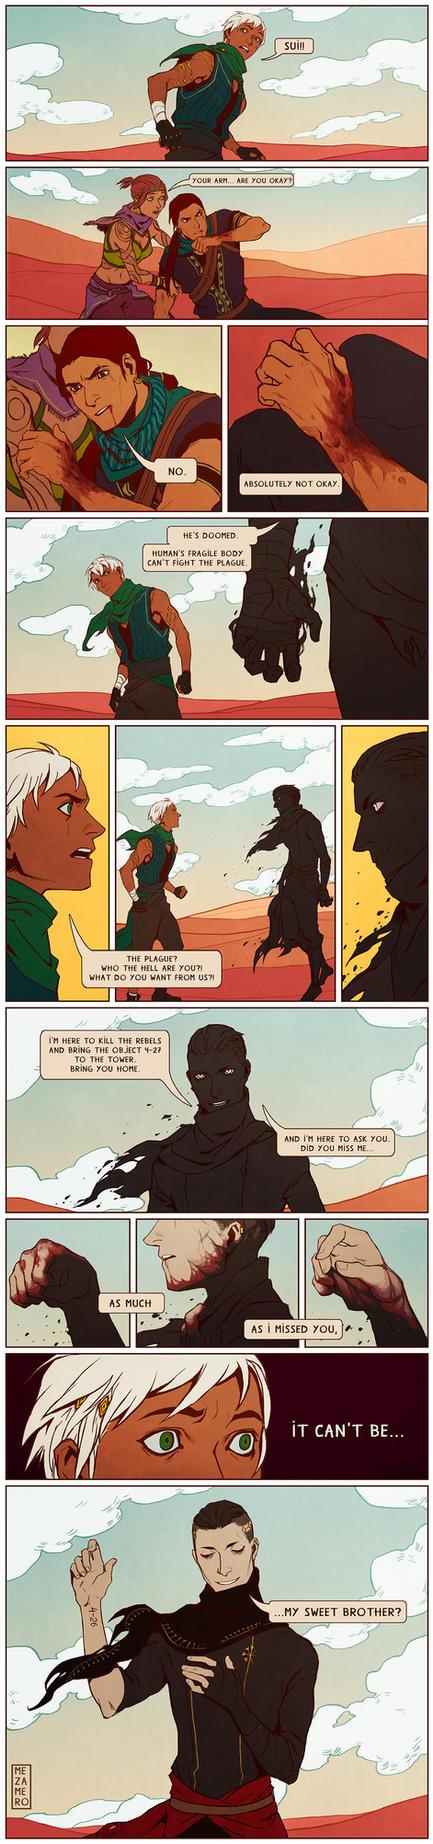 Random page by Mezamero